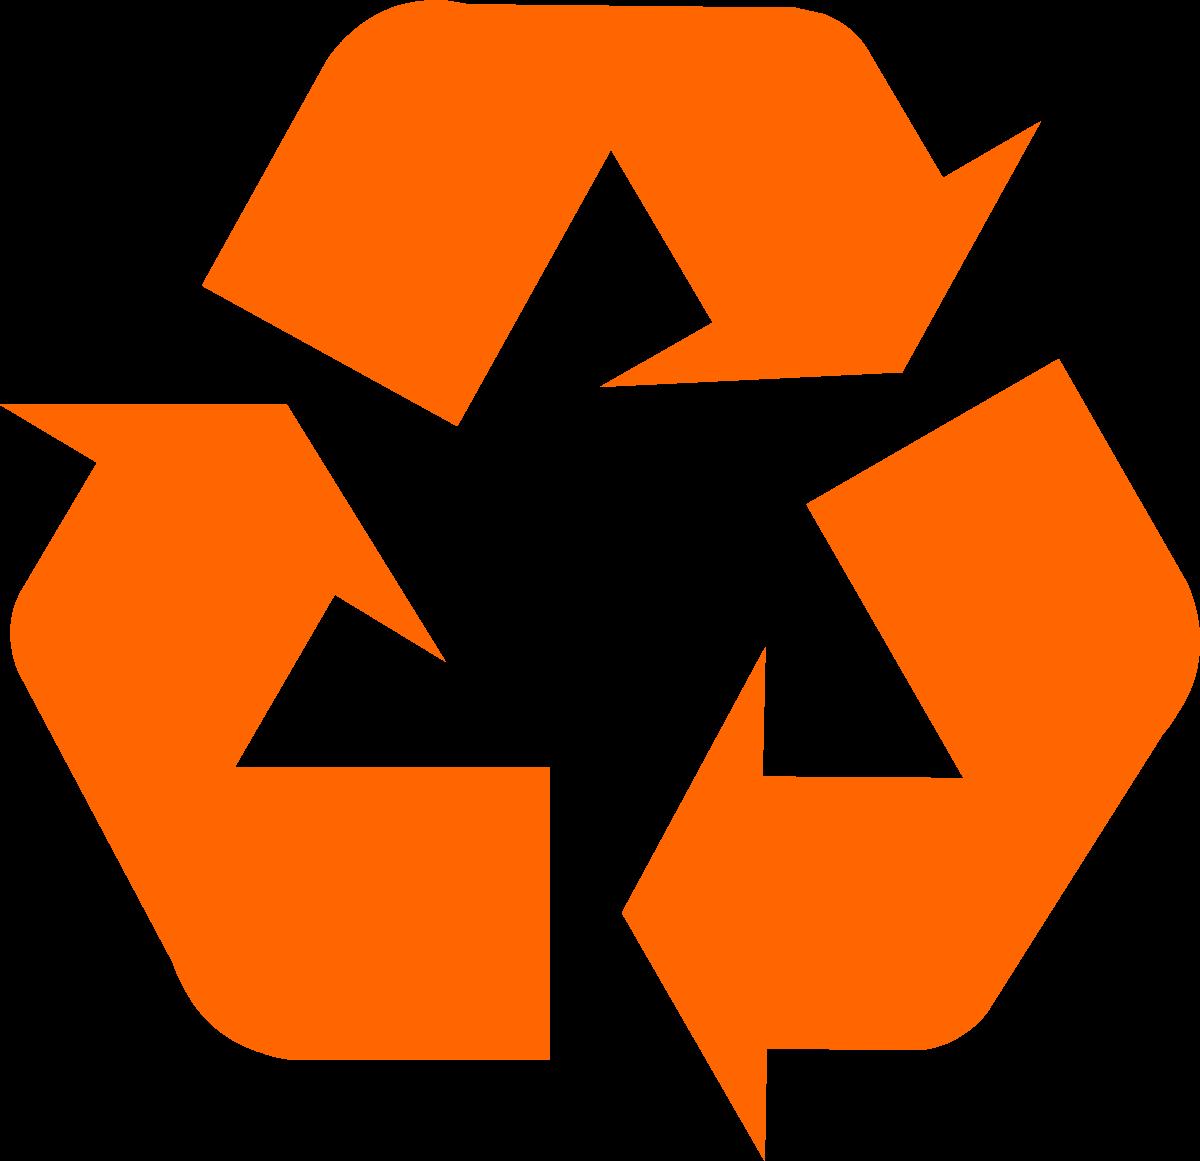 1200x1161 Orange Universal Recycling Symbol Logo Sign